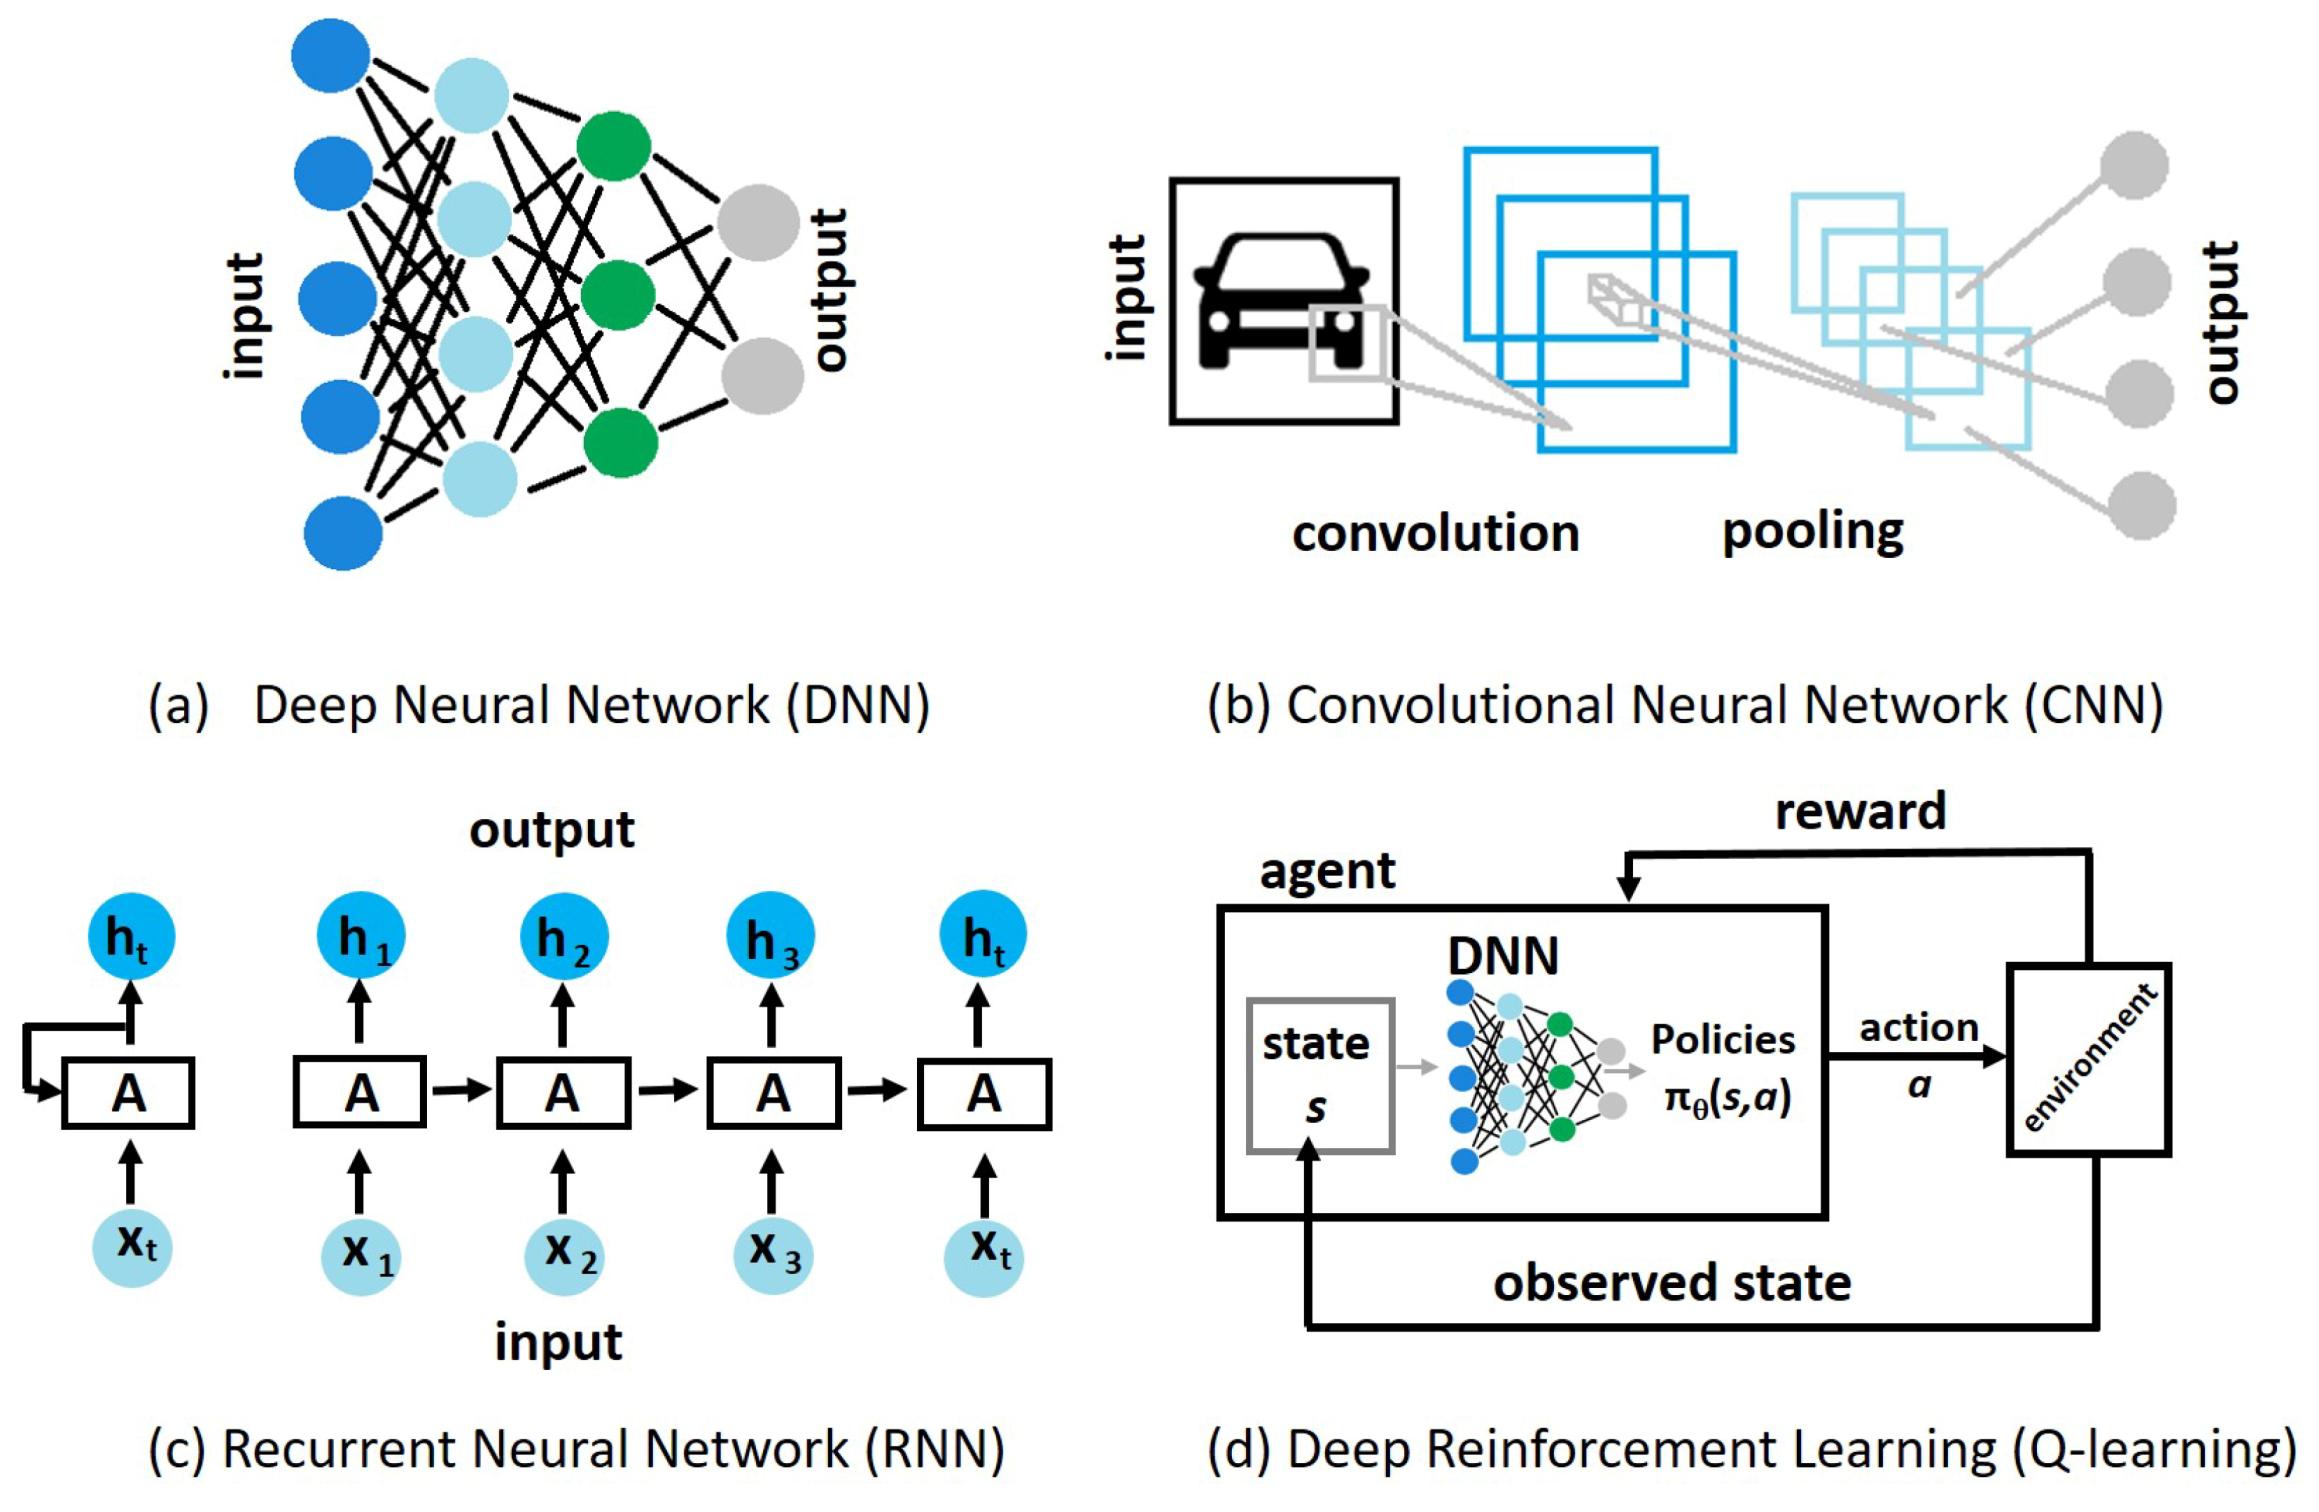 Invertir Inteligencia Artificial Lyxor Robotics unespeculador.com Enric Jaimez Deep Learning